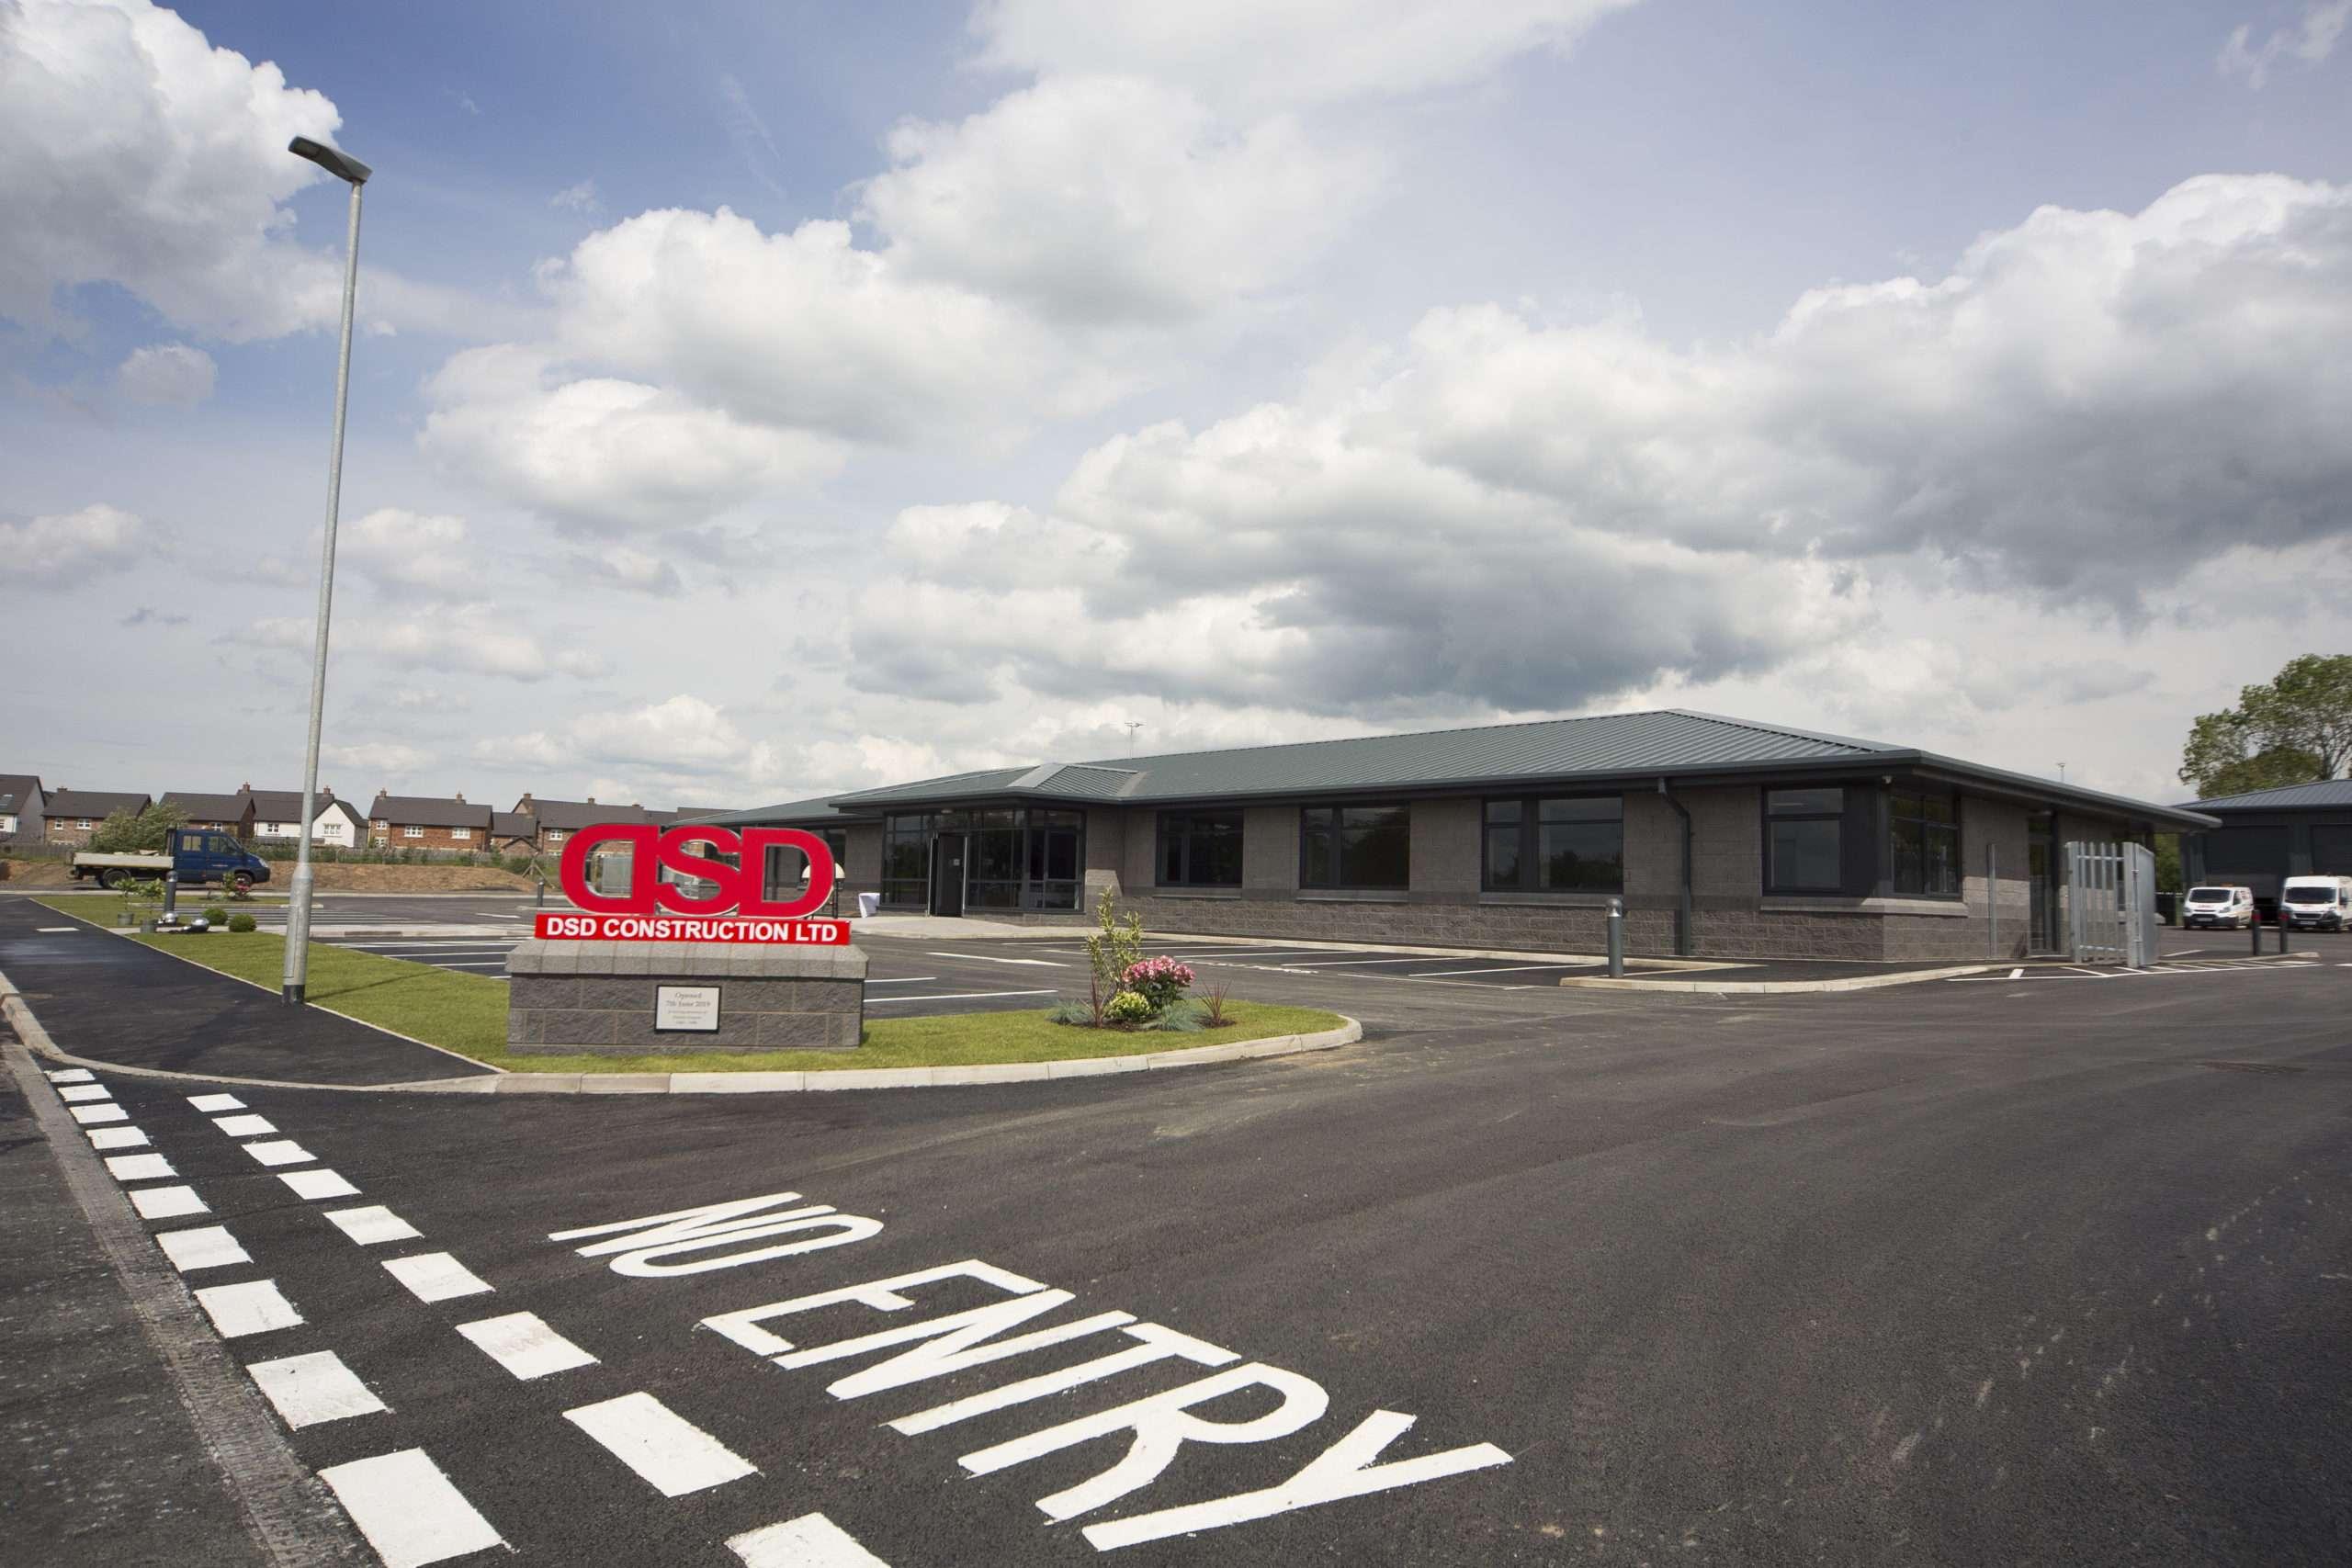 DSD building exterior